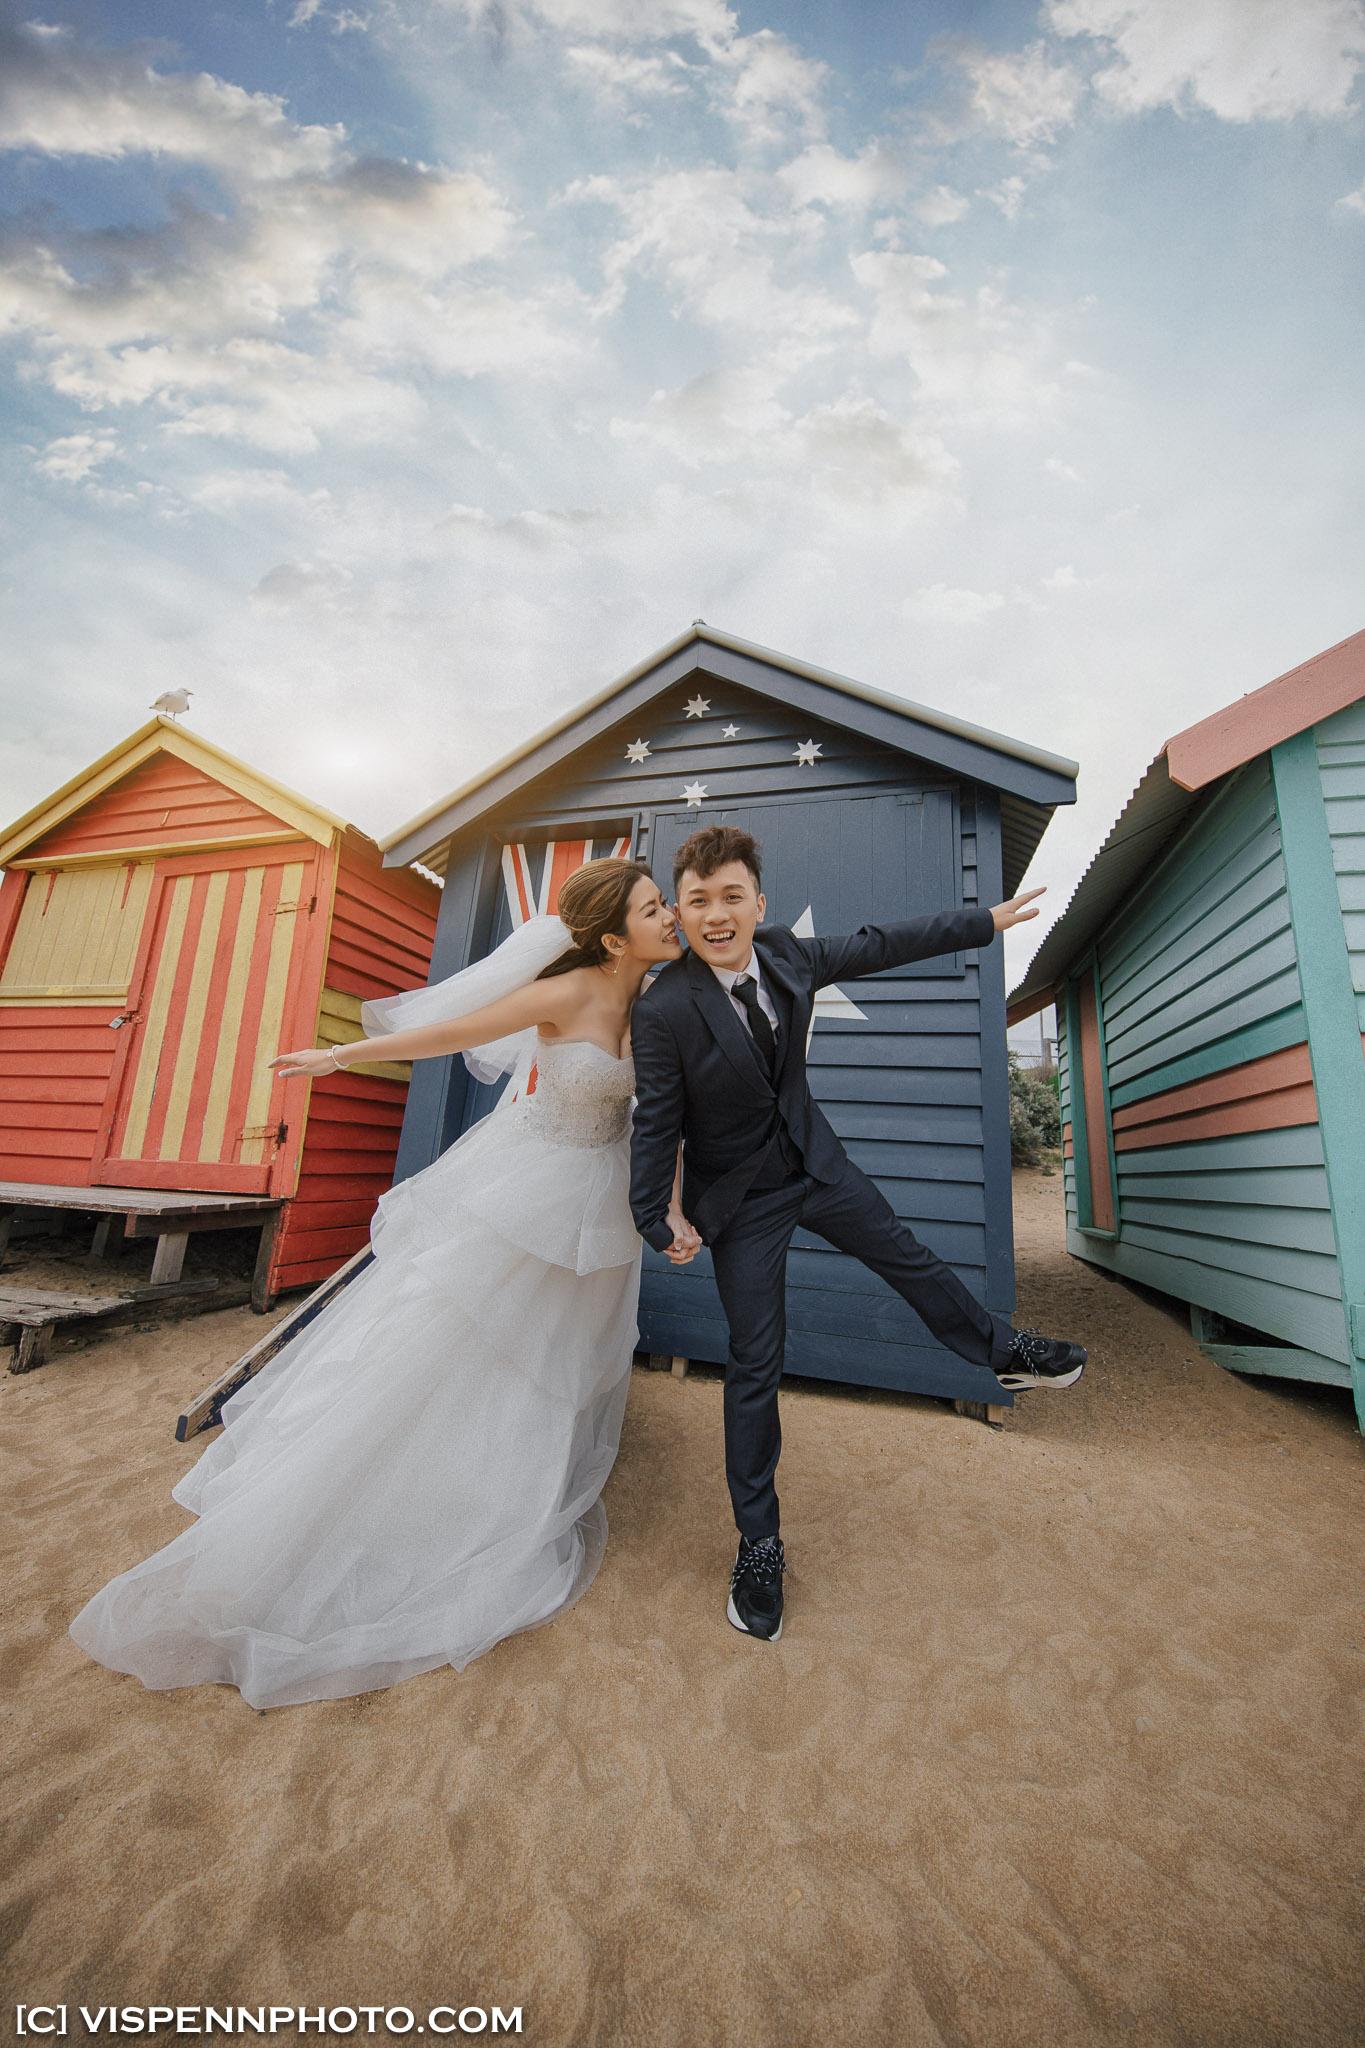 PRE WEDDING Photography Melbourne VISPENN 墨尔本 婚纱照 结婚照 婚纱摄影 GiGi 6737 EOSR VISPENN